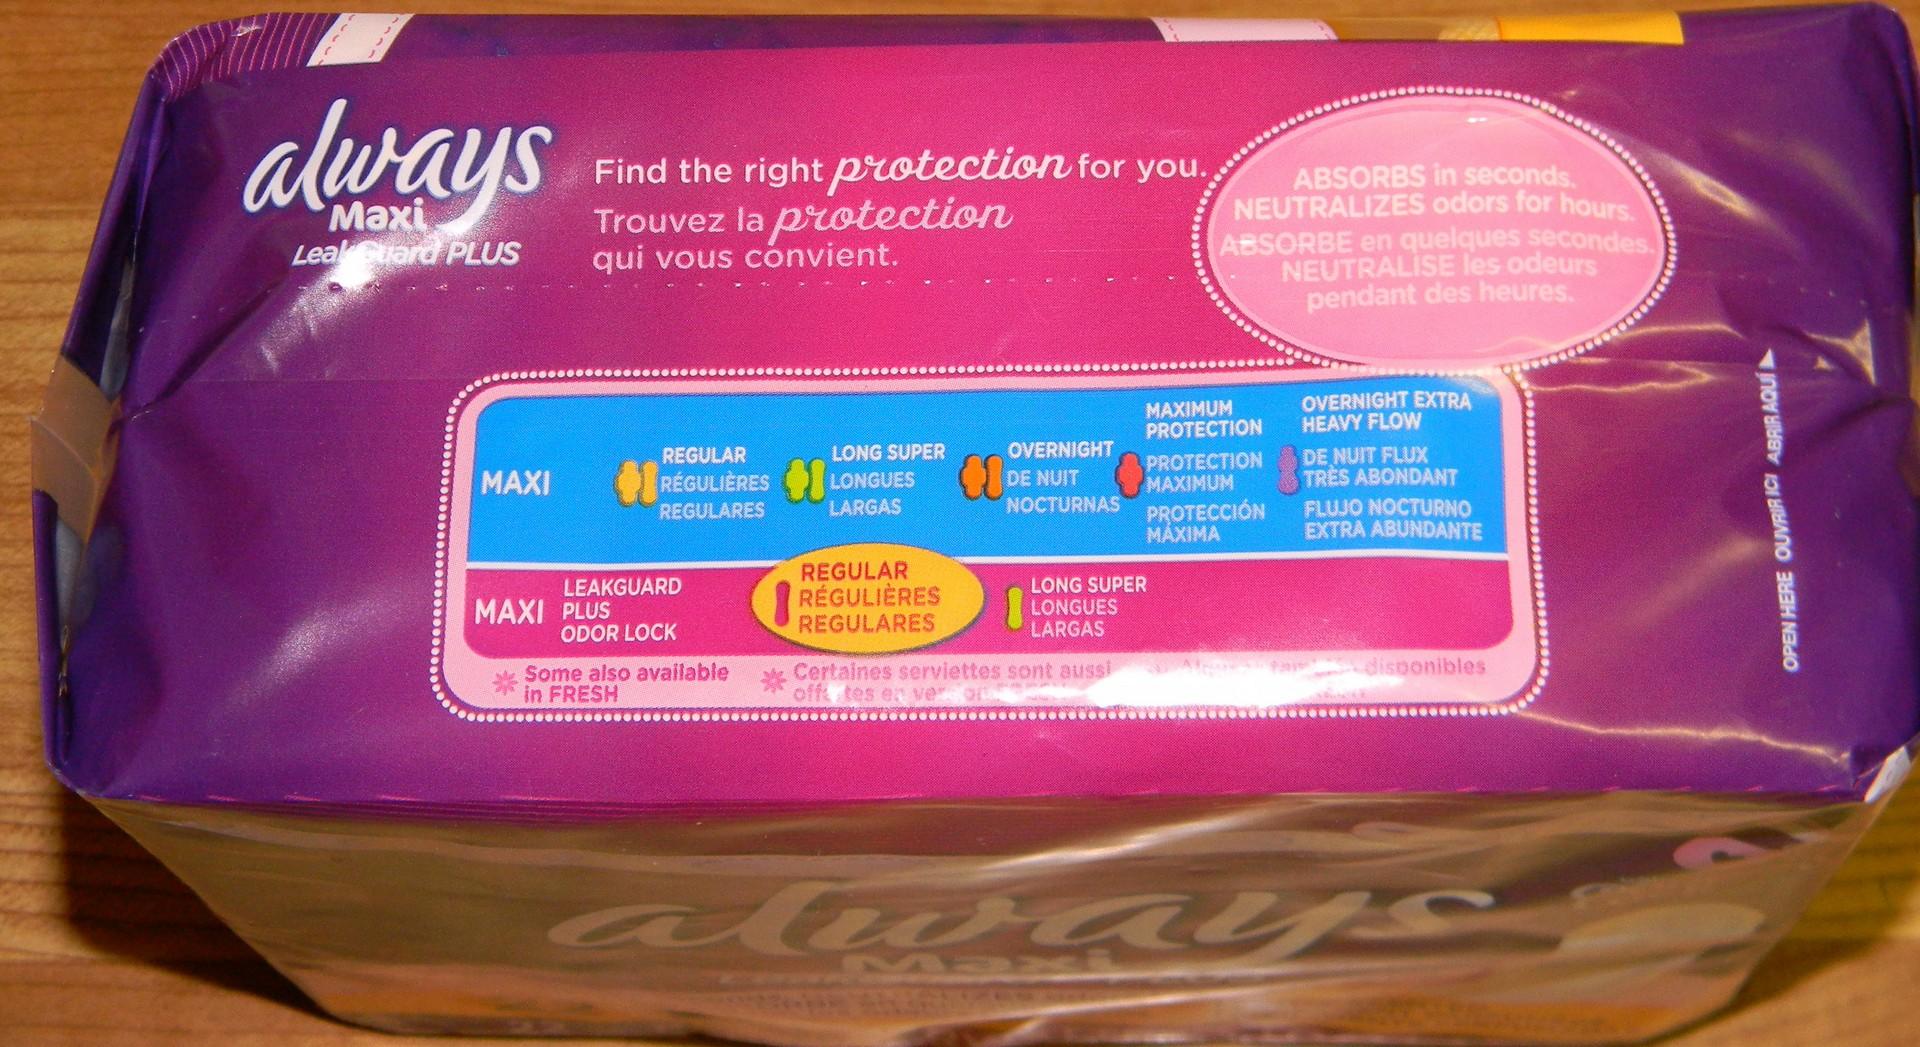 Transvestite menstrual pad odor really. And